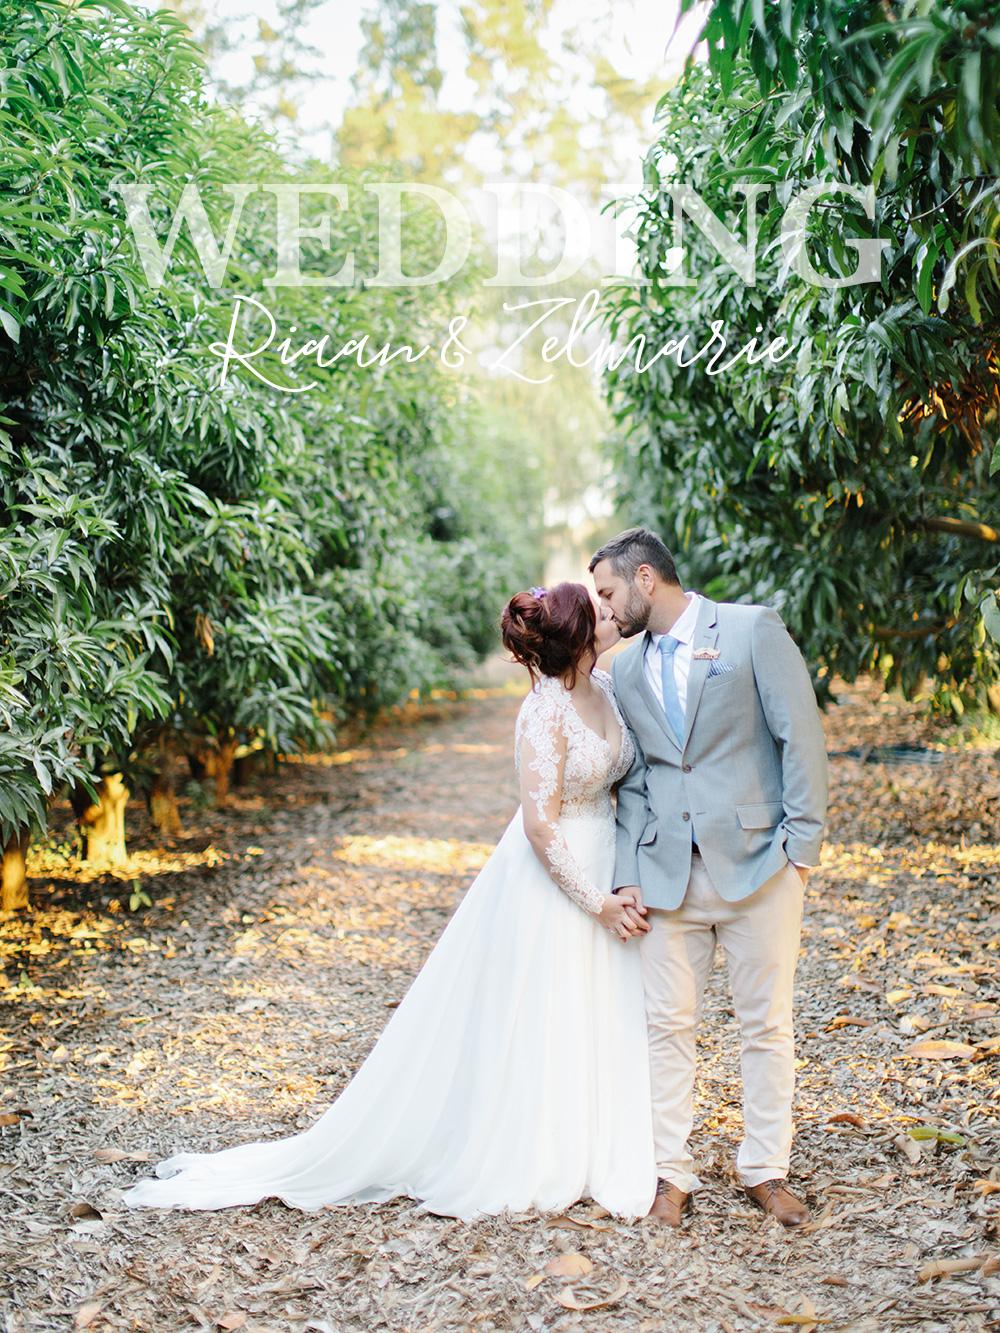 Lowveld wedding